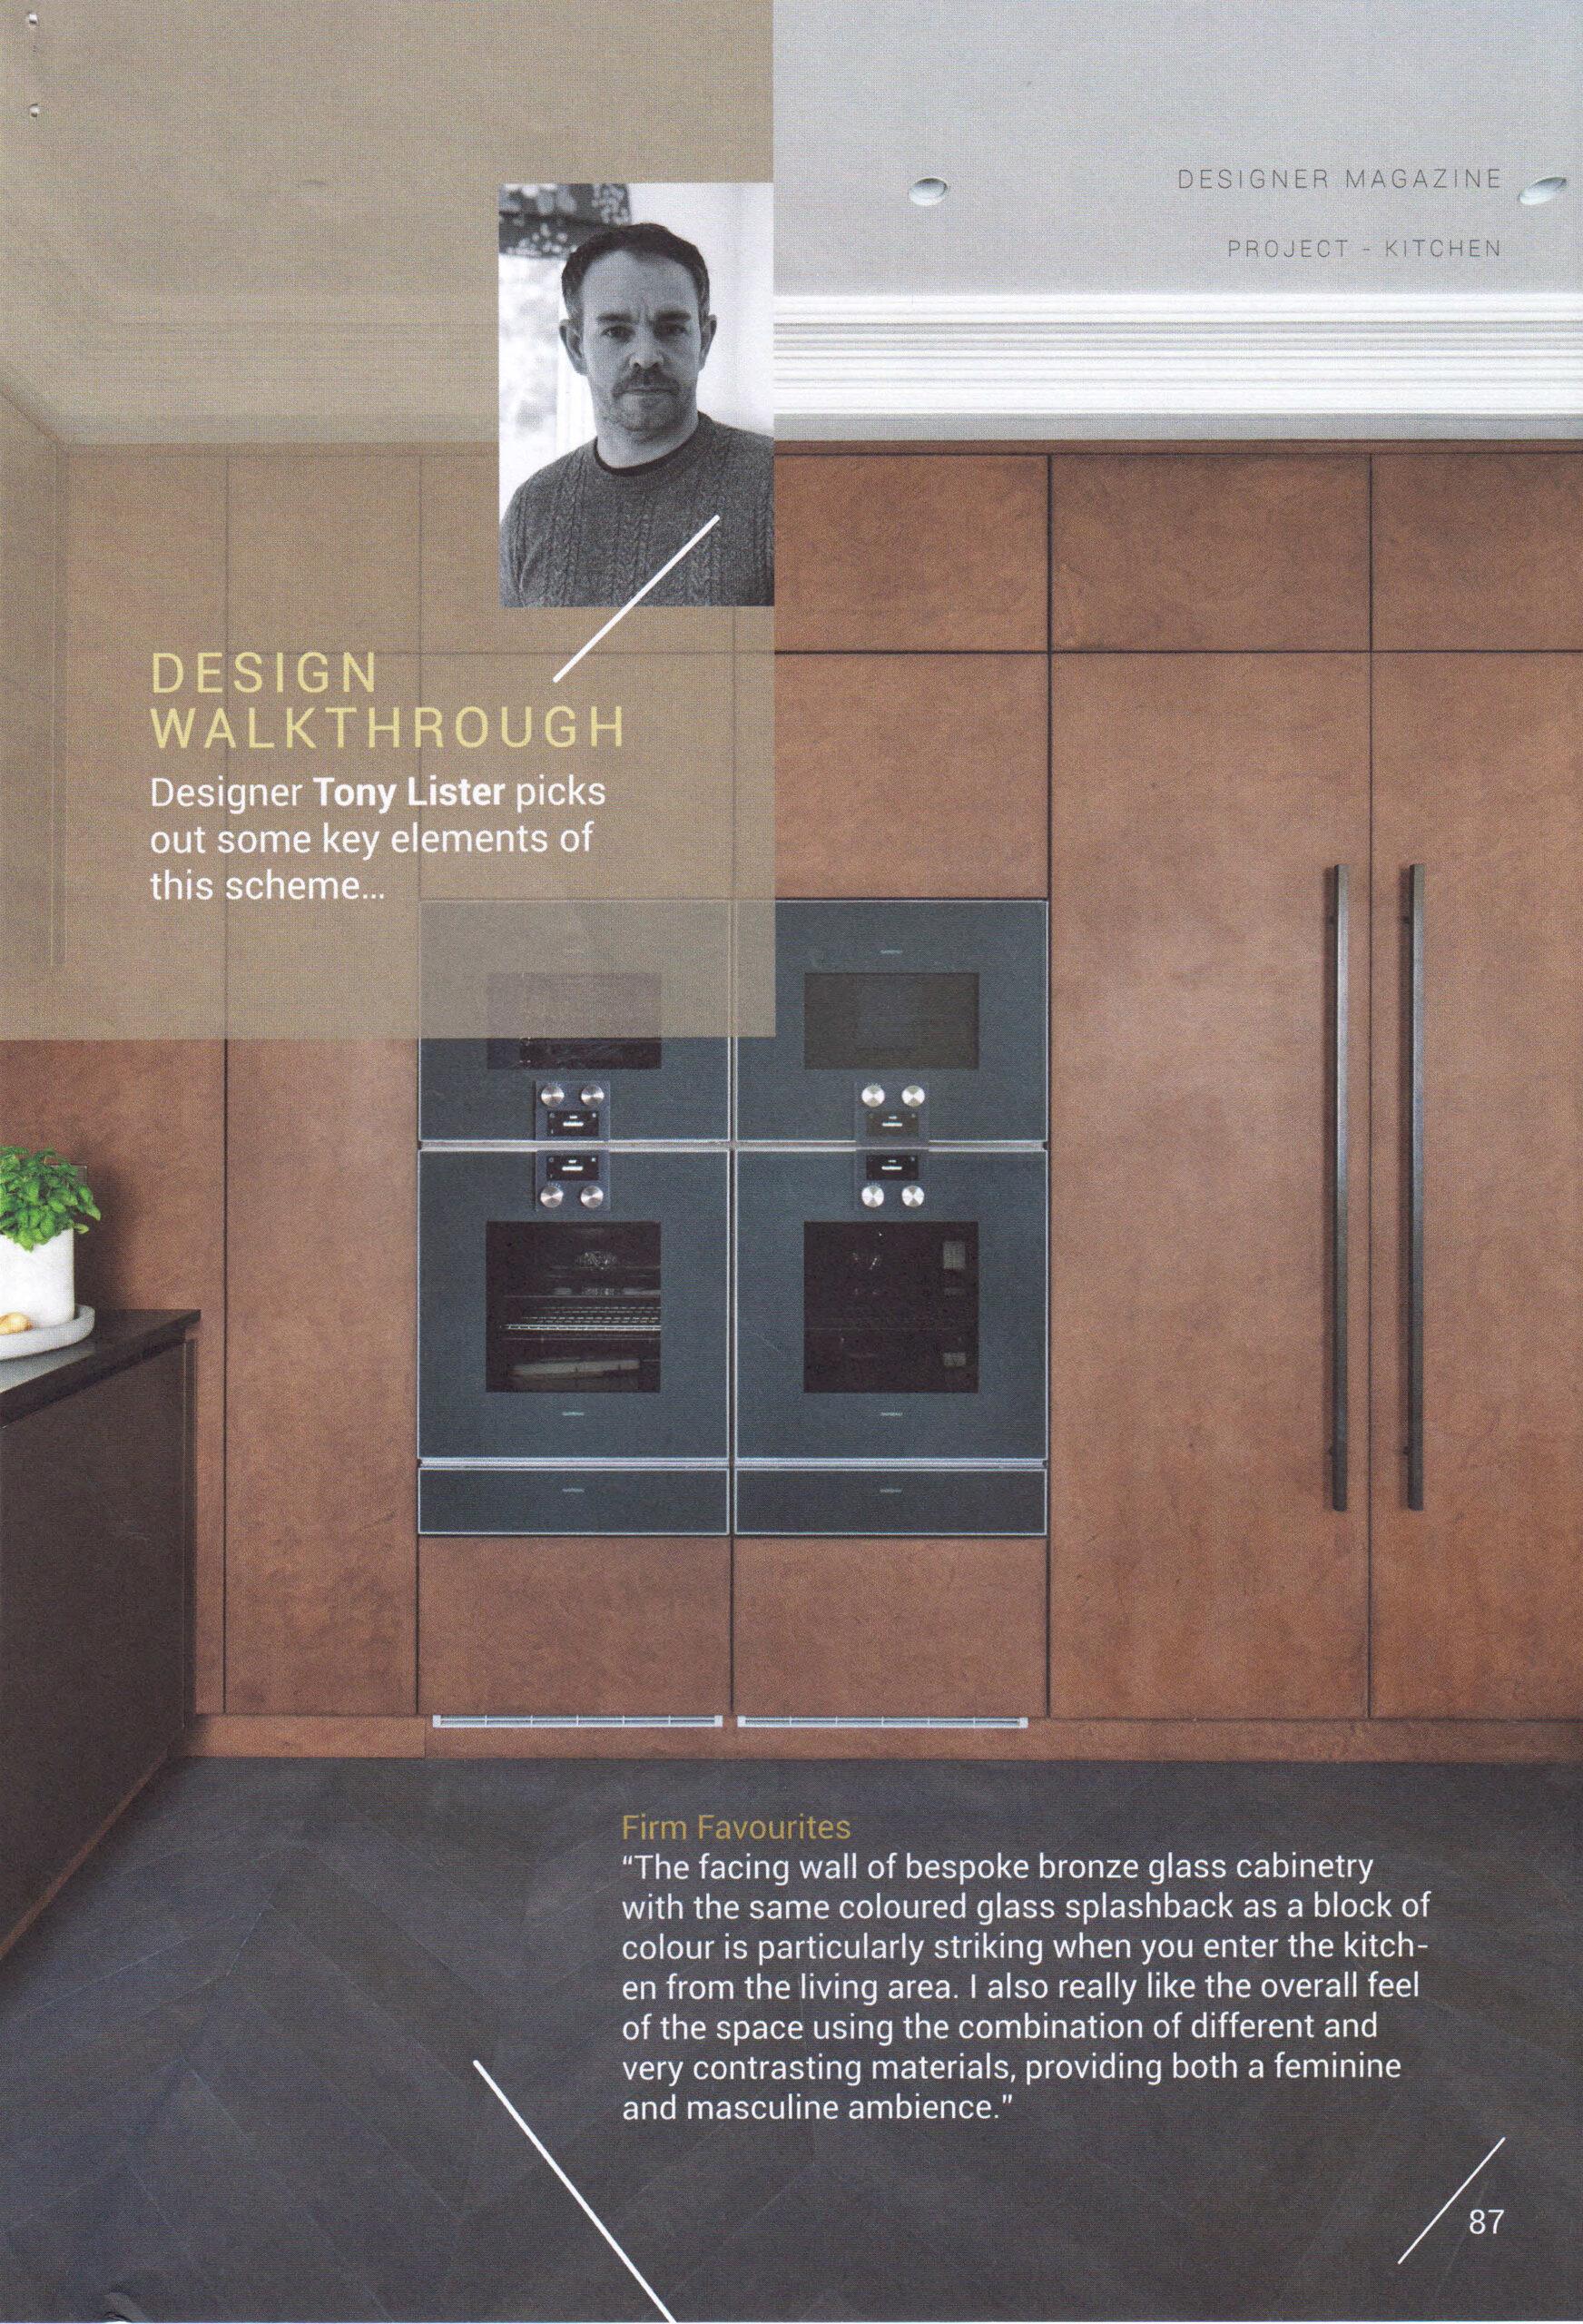 Designer Magazine - Green Park Case Study 4